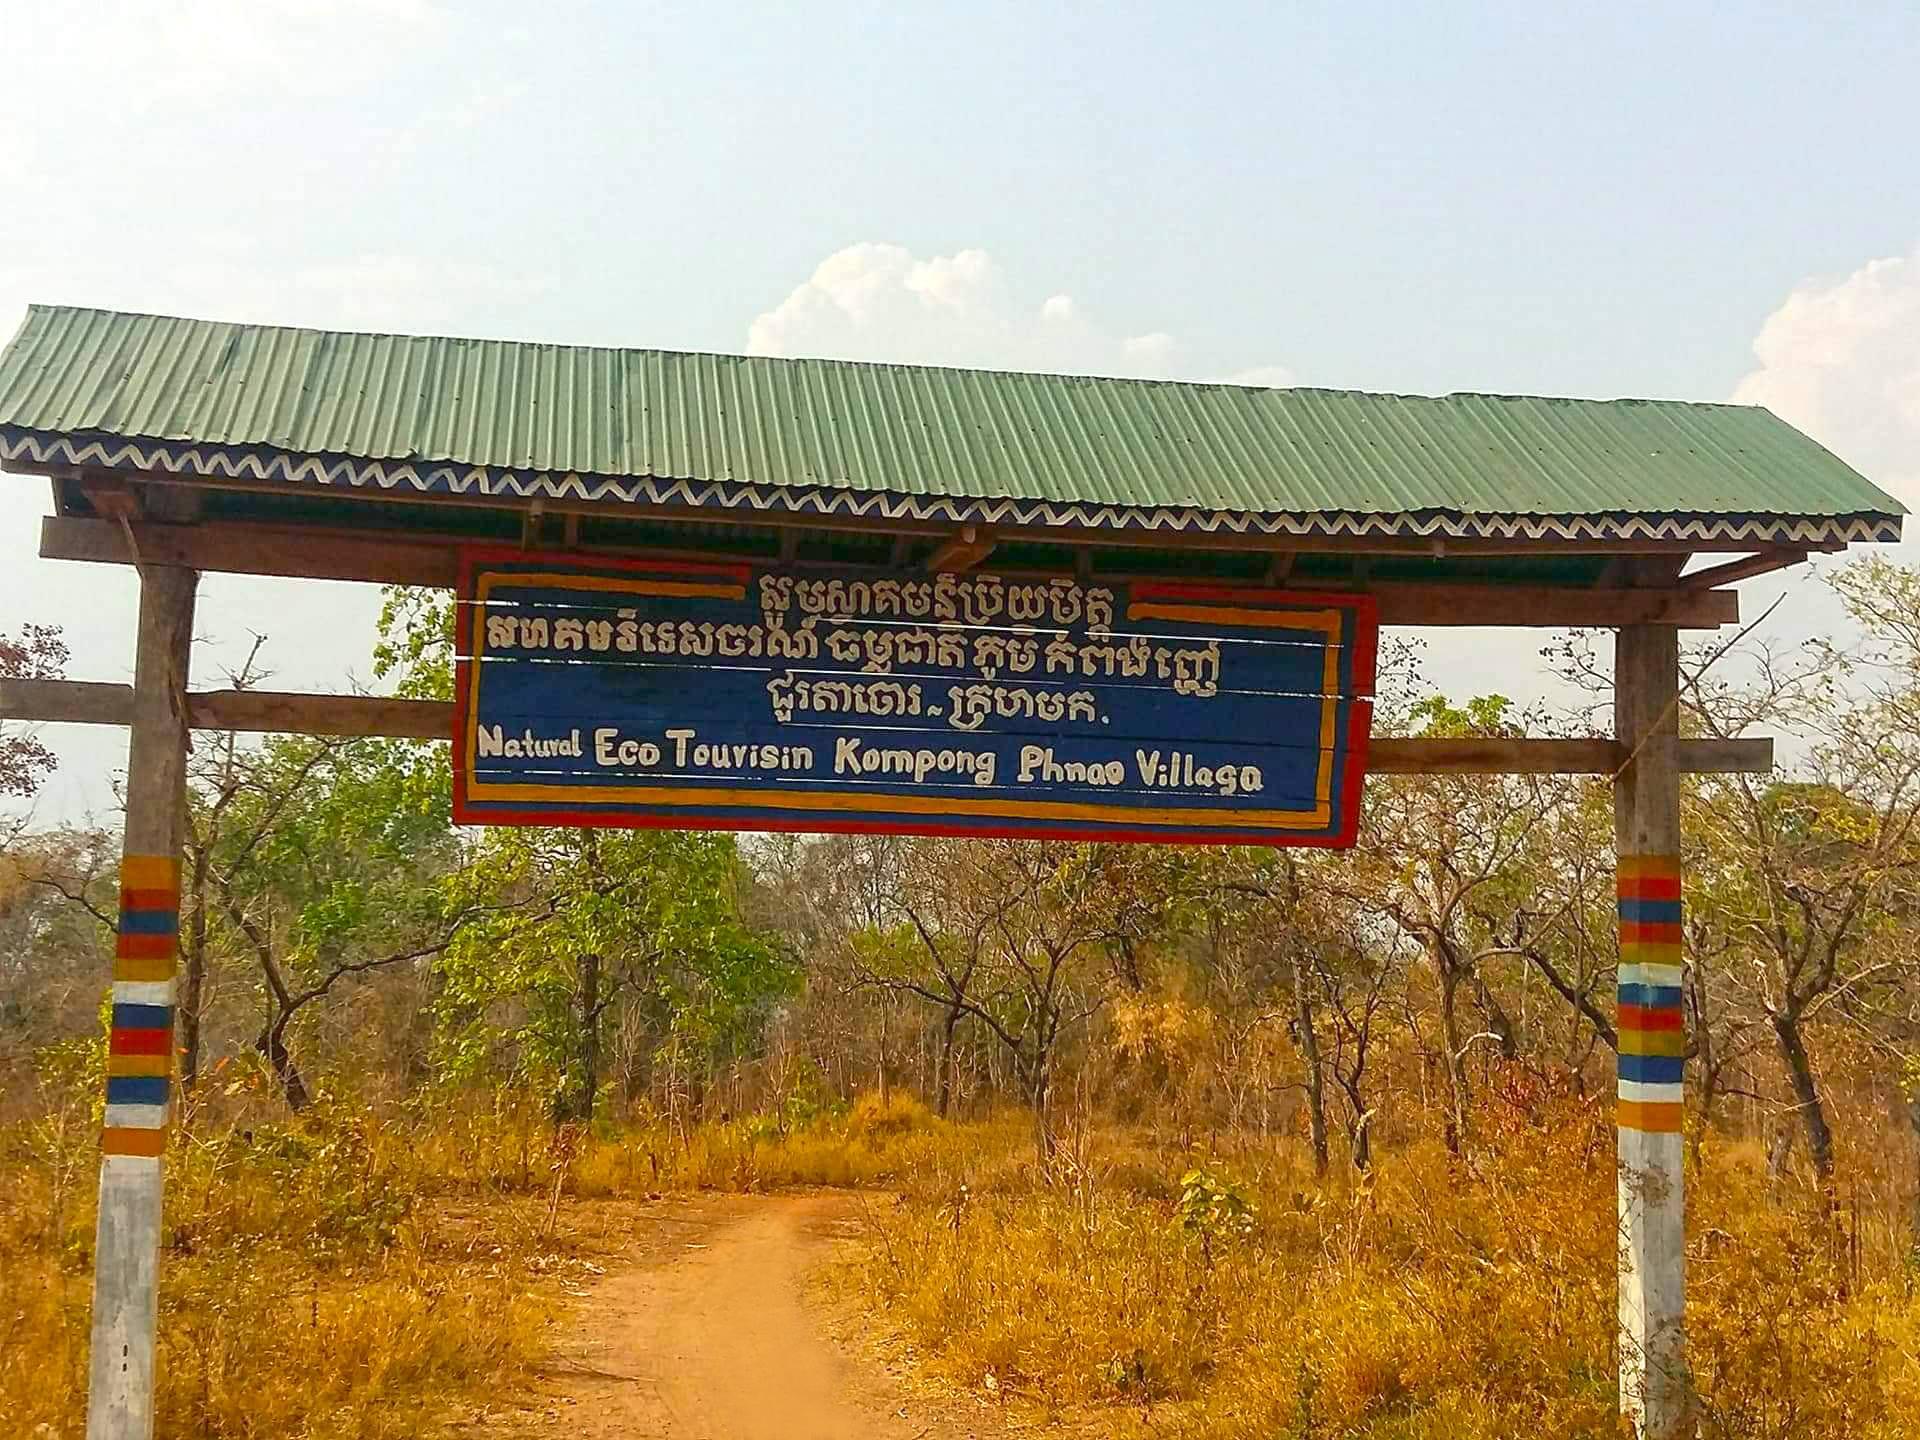 Natural Eco Tourism Kampong Phnov Village